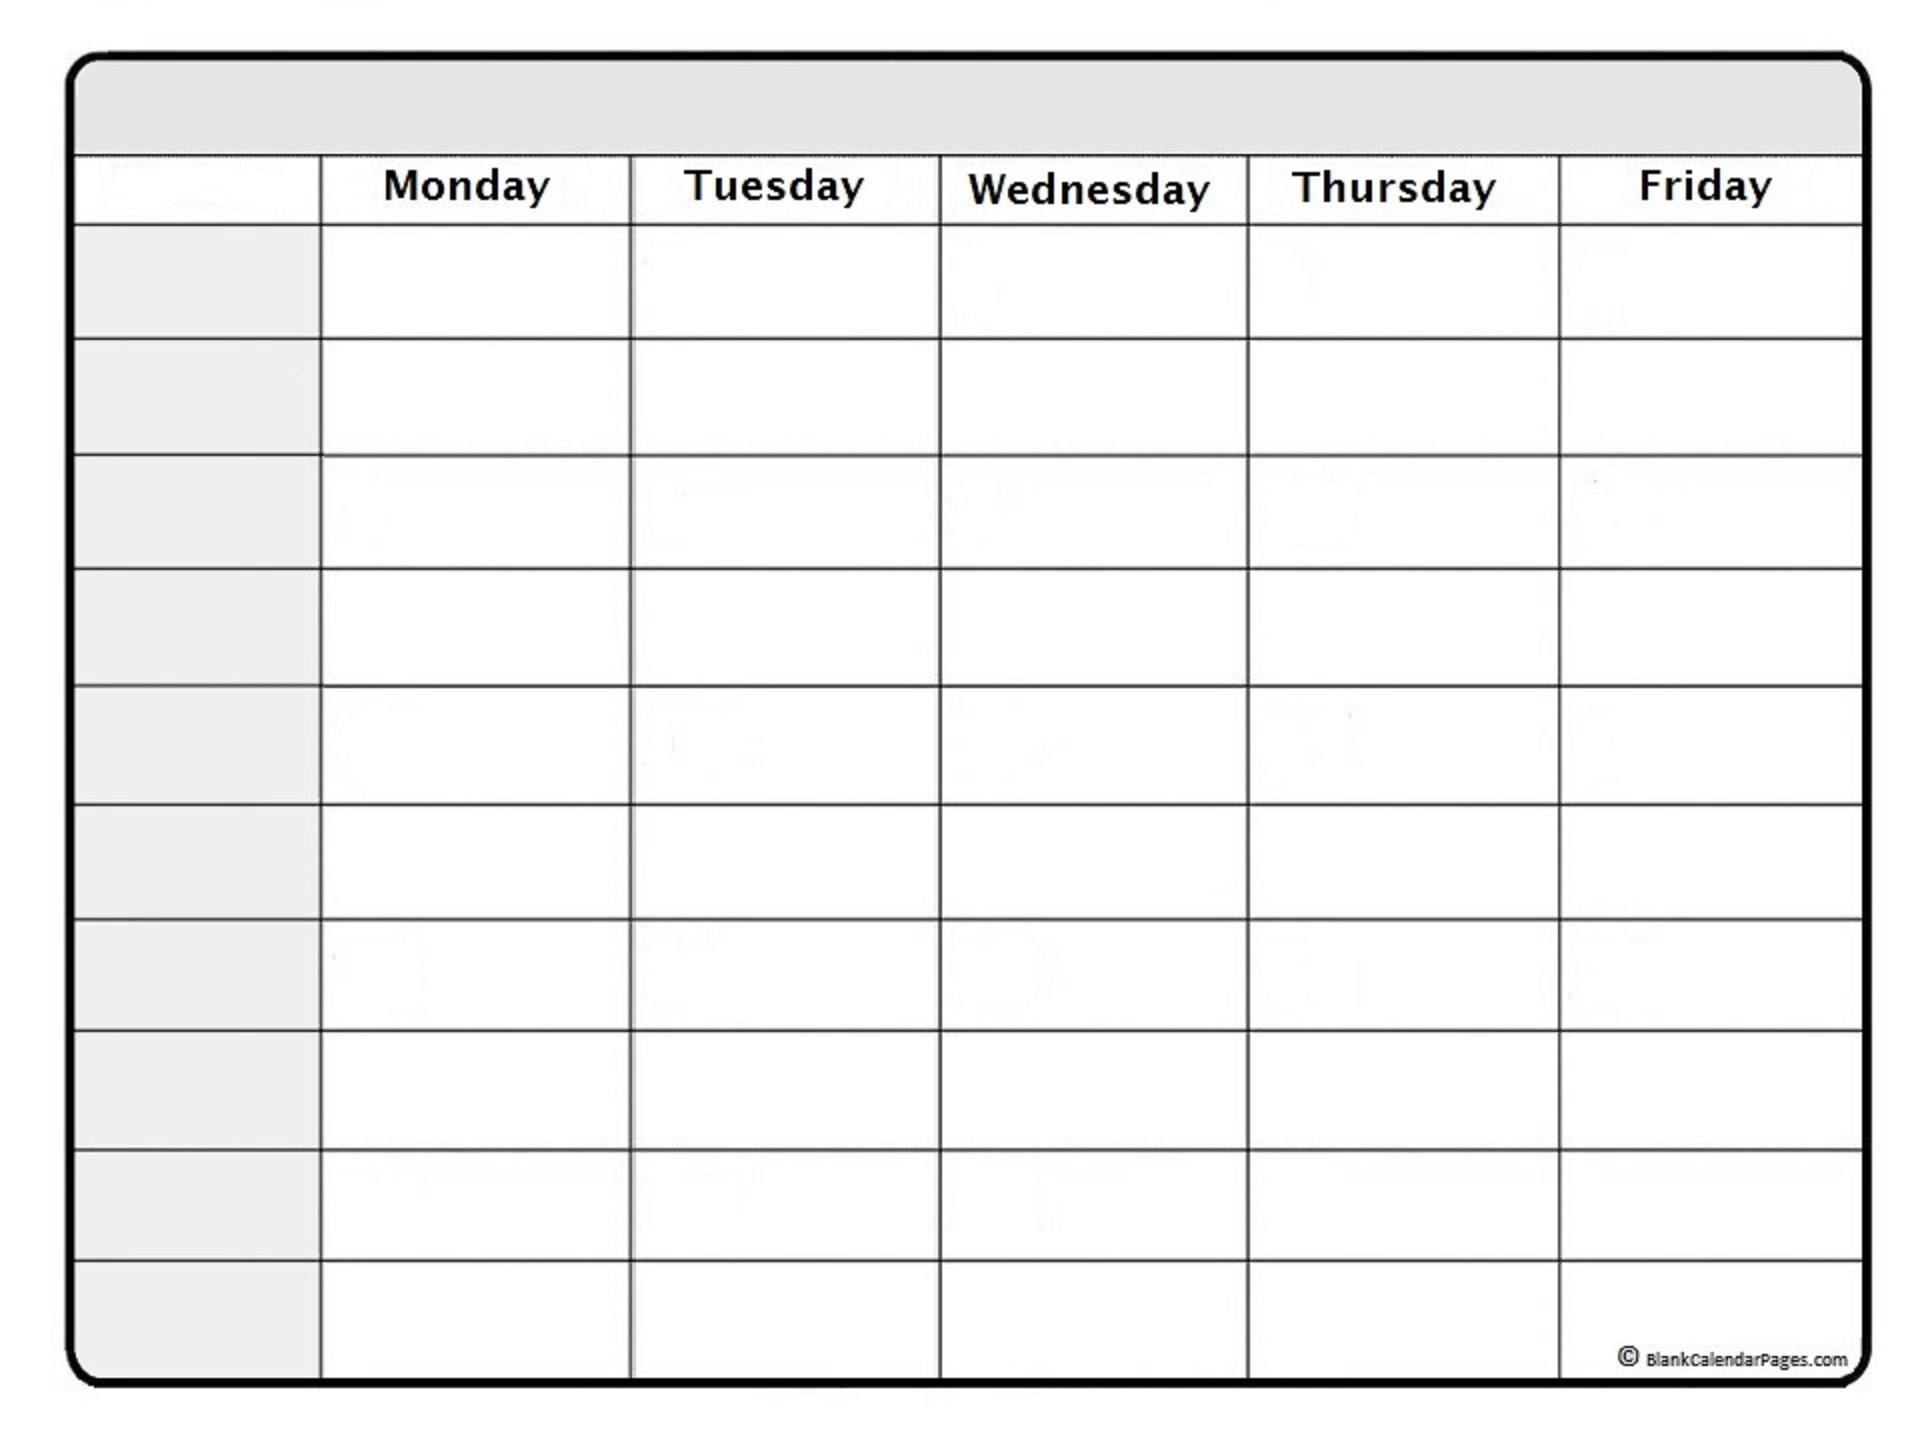 December 2020 Weekly Calendar | December 2020 Weekly 7 Day Calendar Template